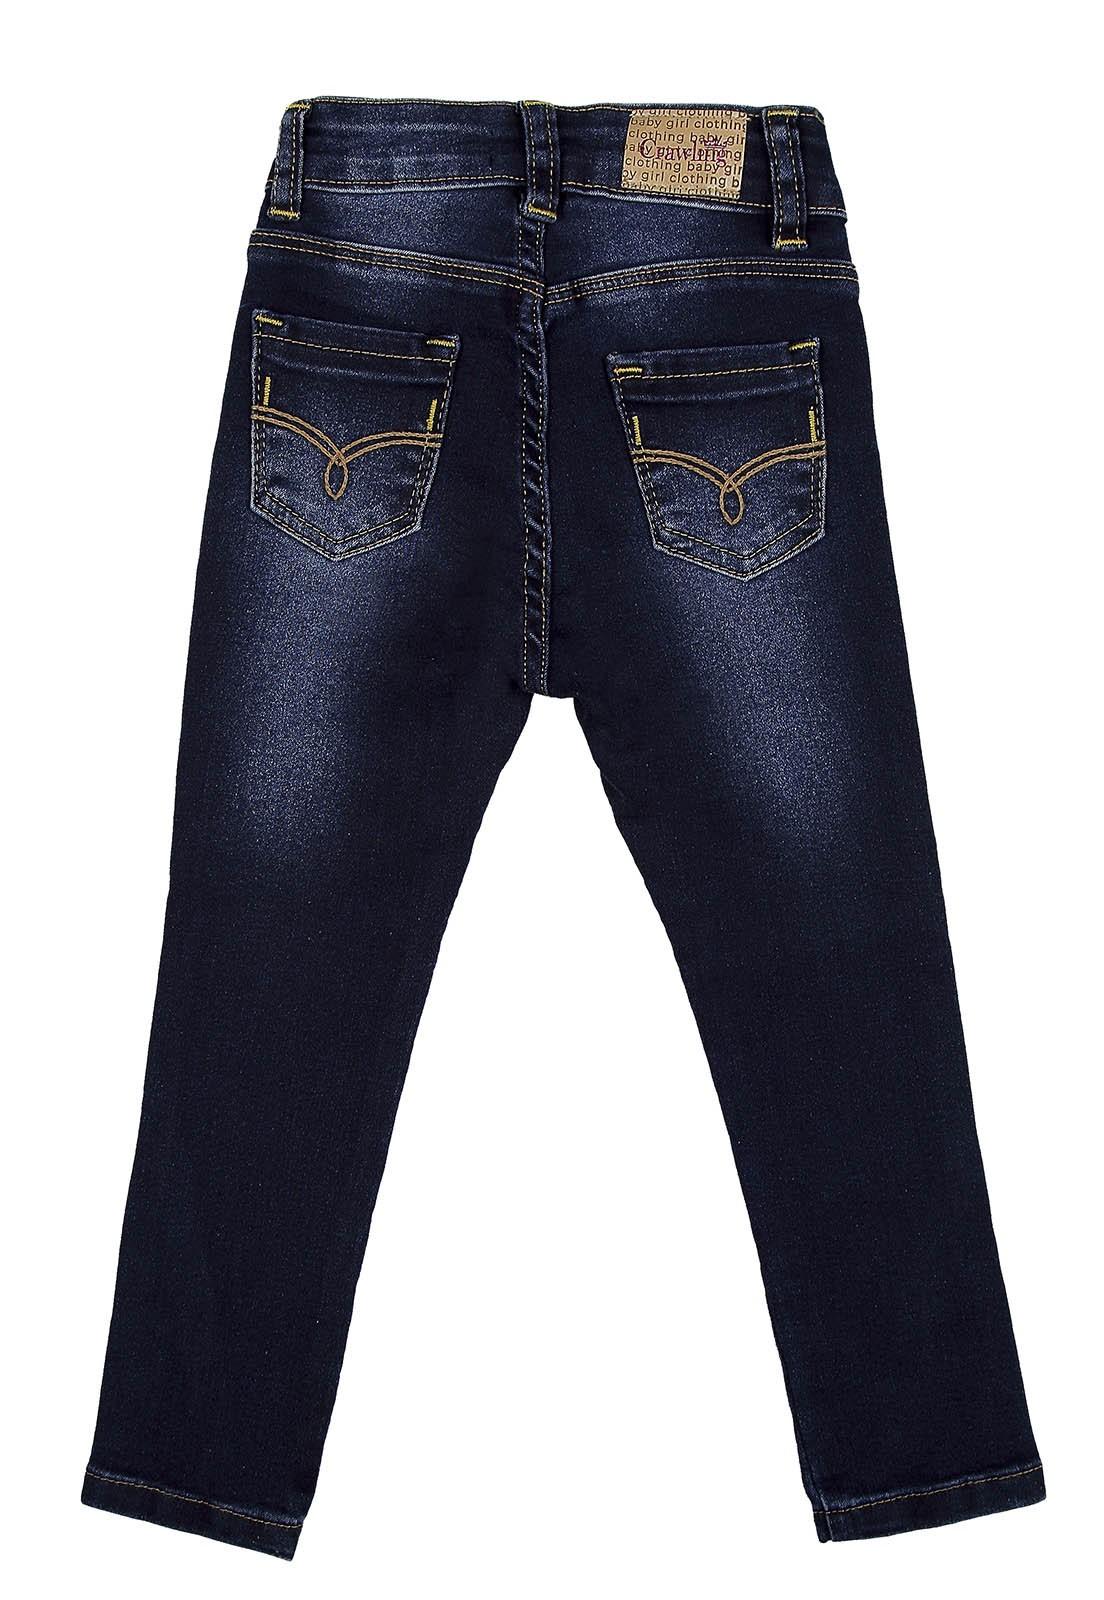 Calça Baby Girl Crawling Jeans Skinny